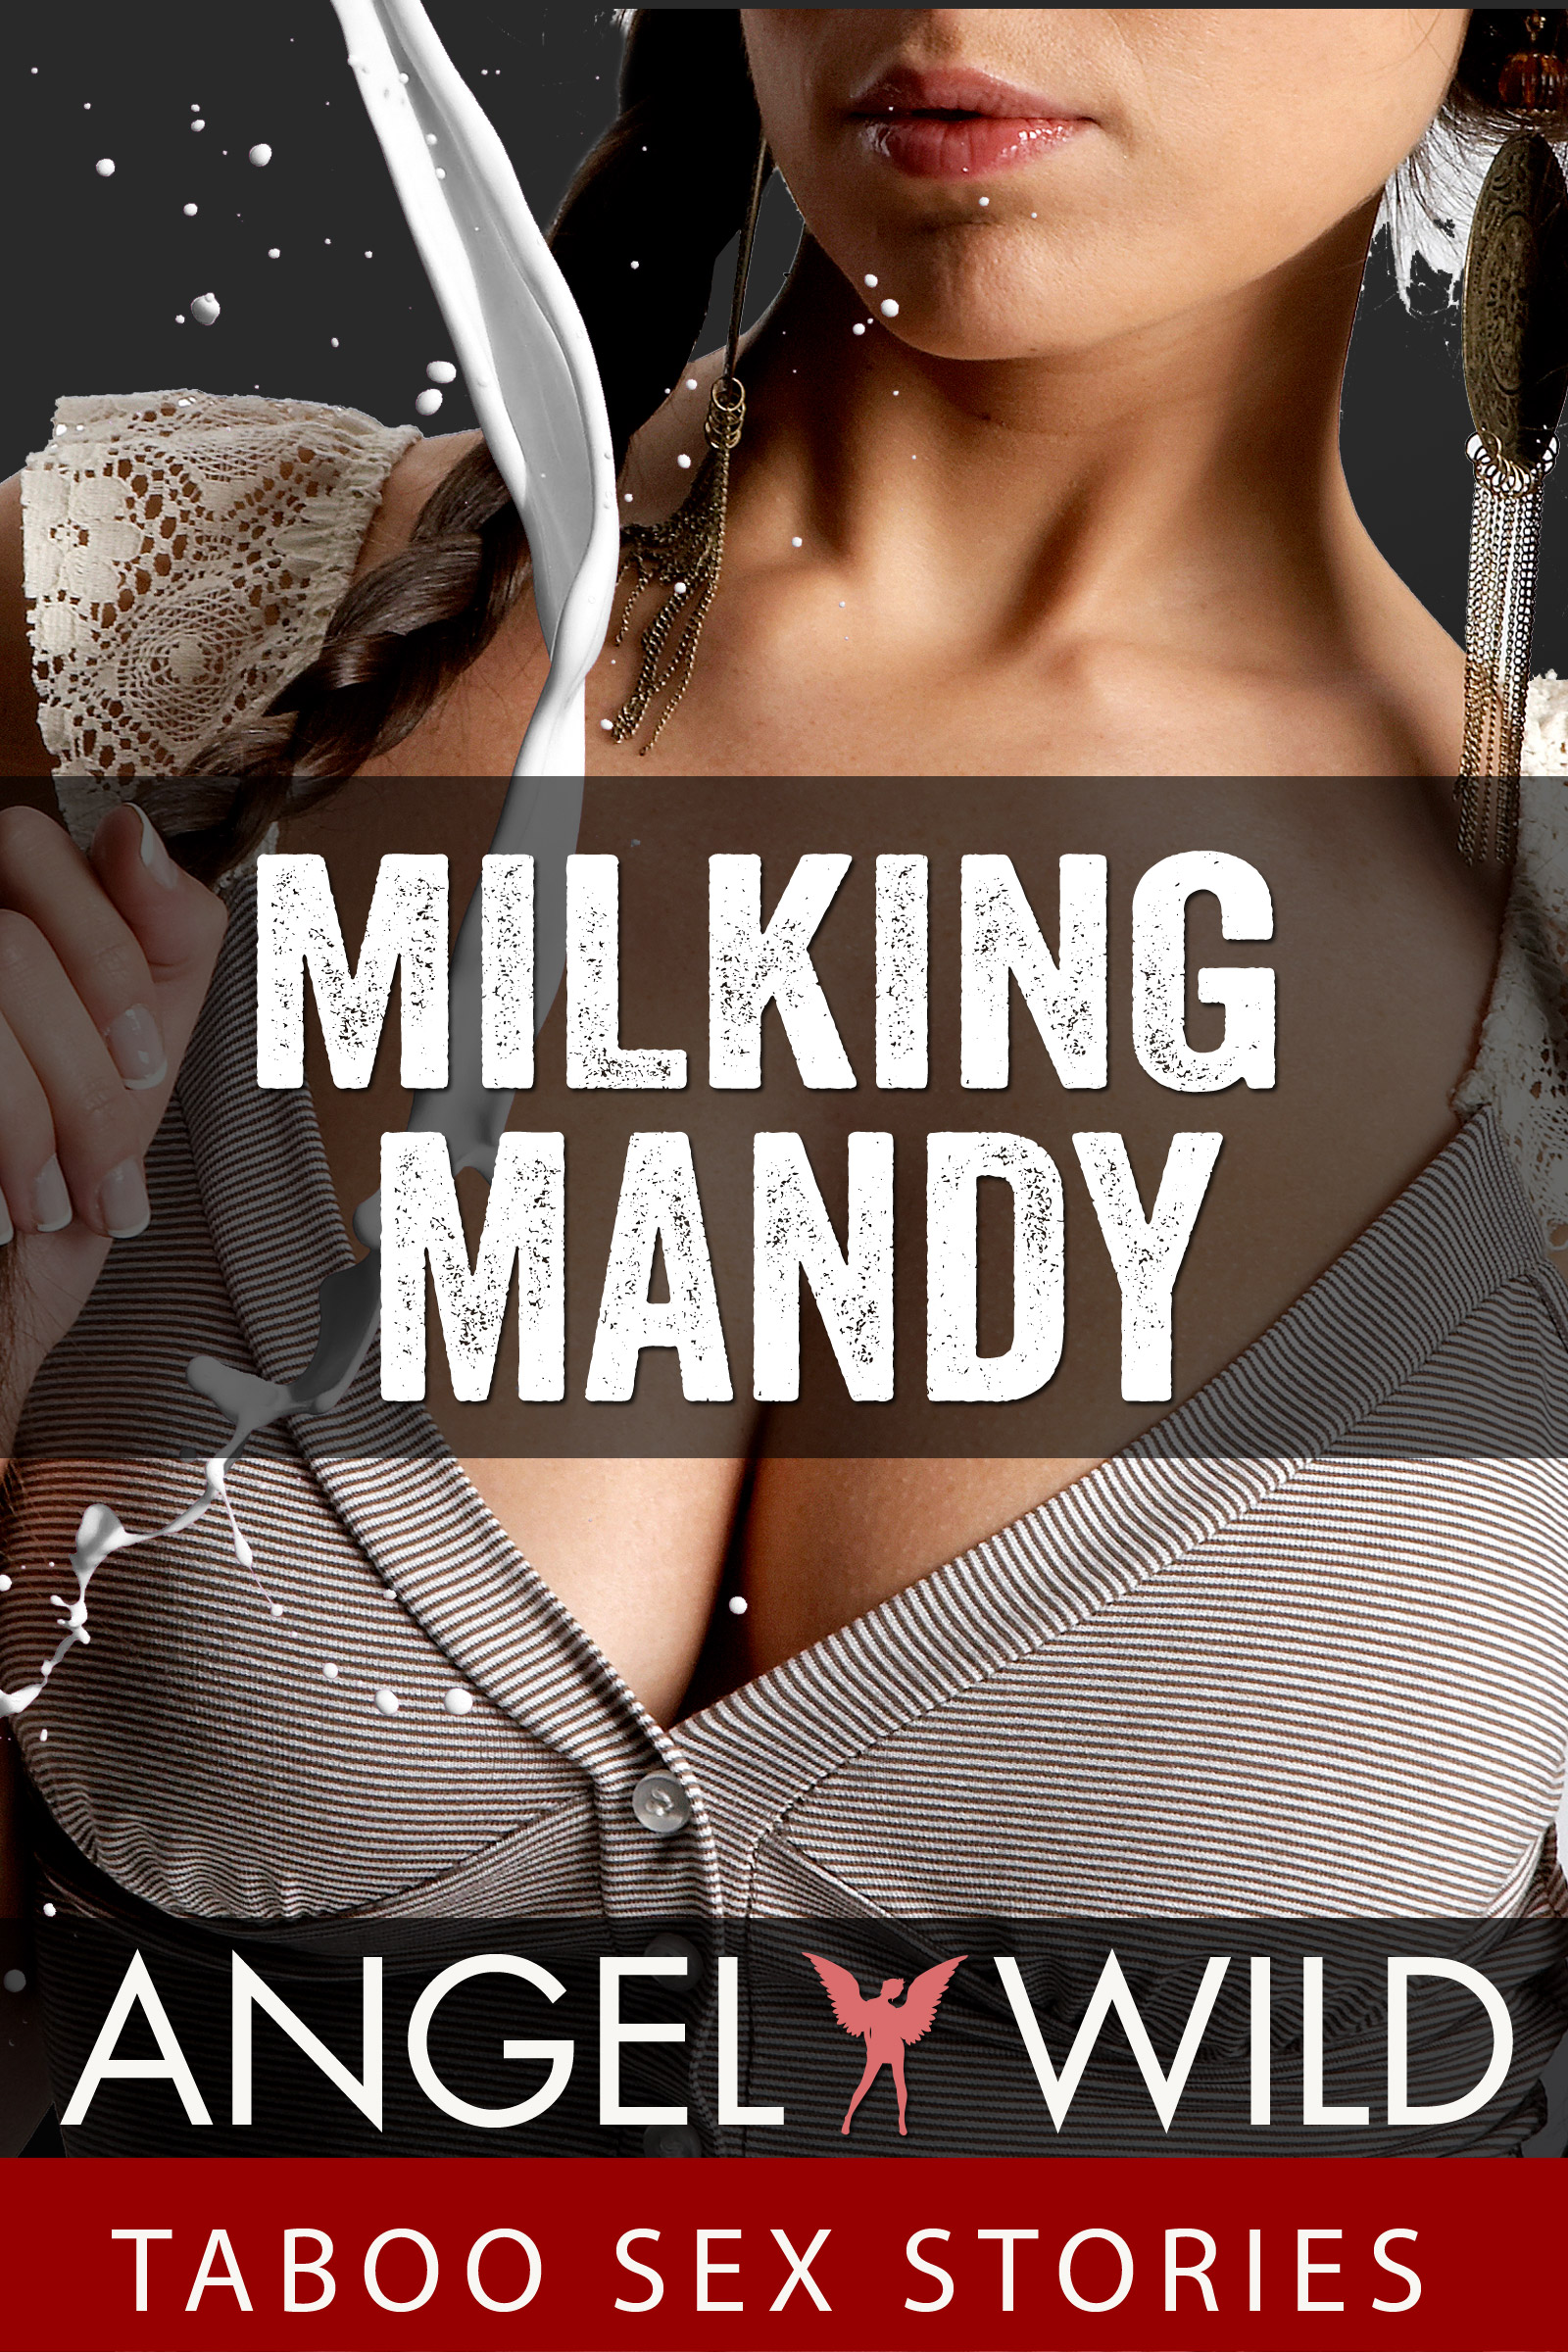 Milking Mandy (Taboo Sex Stories). By Angel Wild